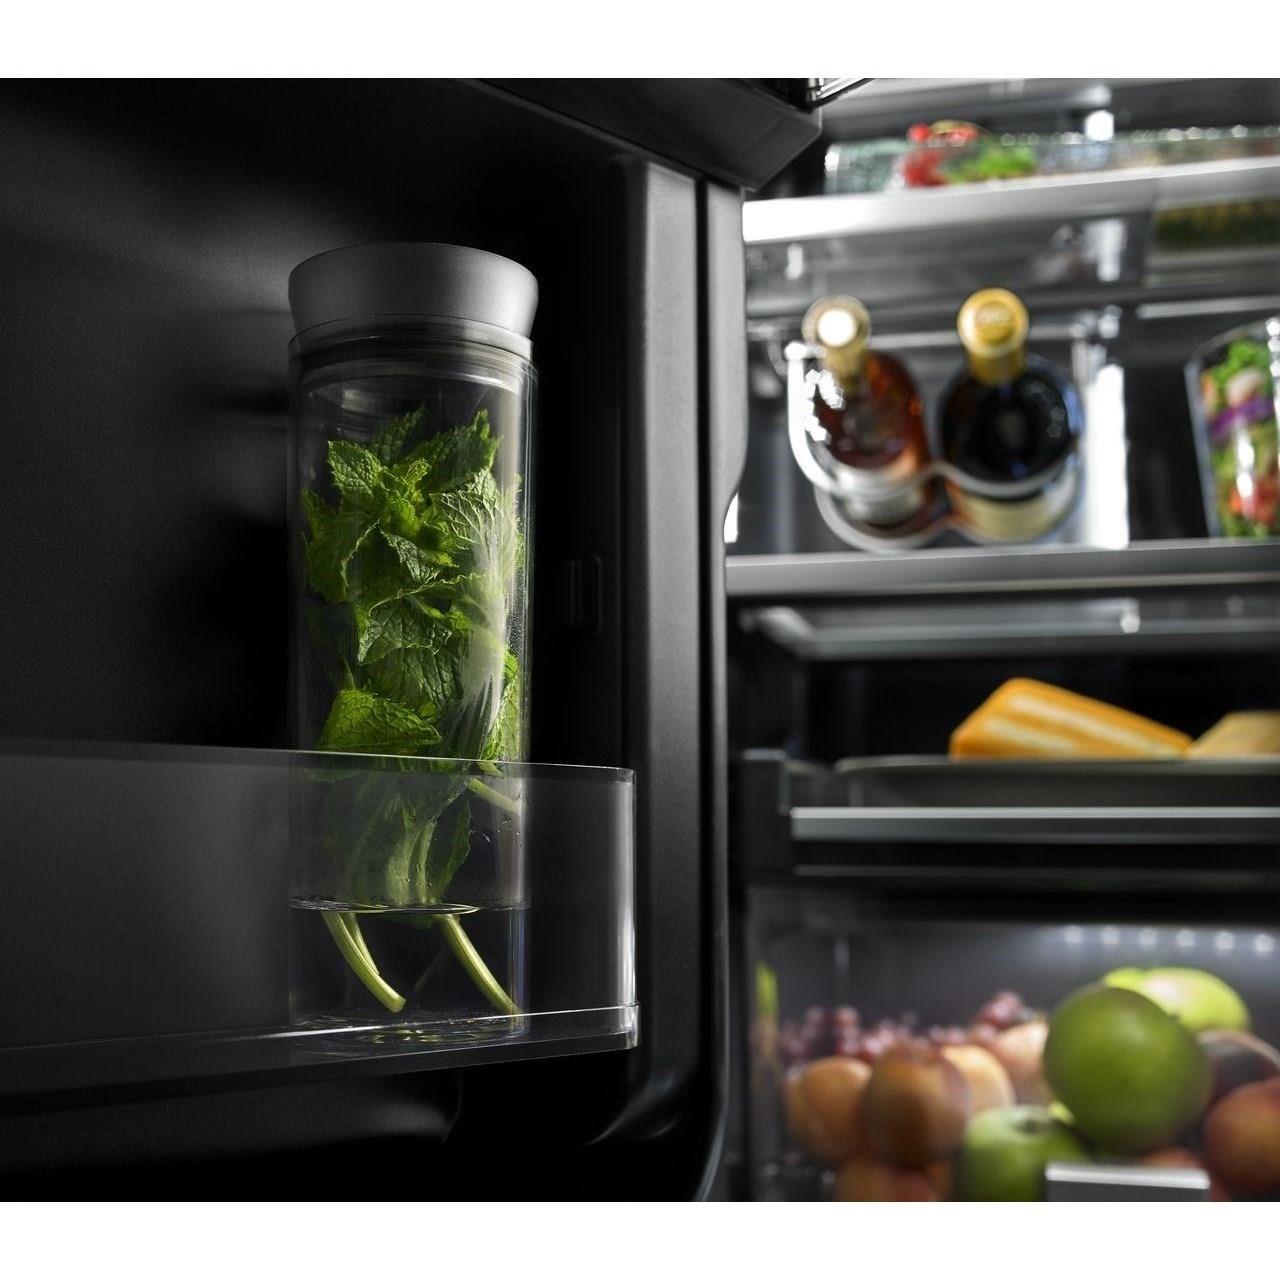 Jenn air jffcc72efp72 counter depth french door for Obsidian interior refrigerator